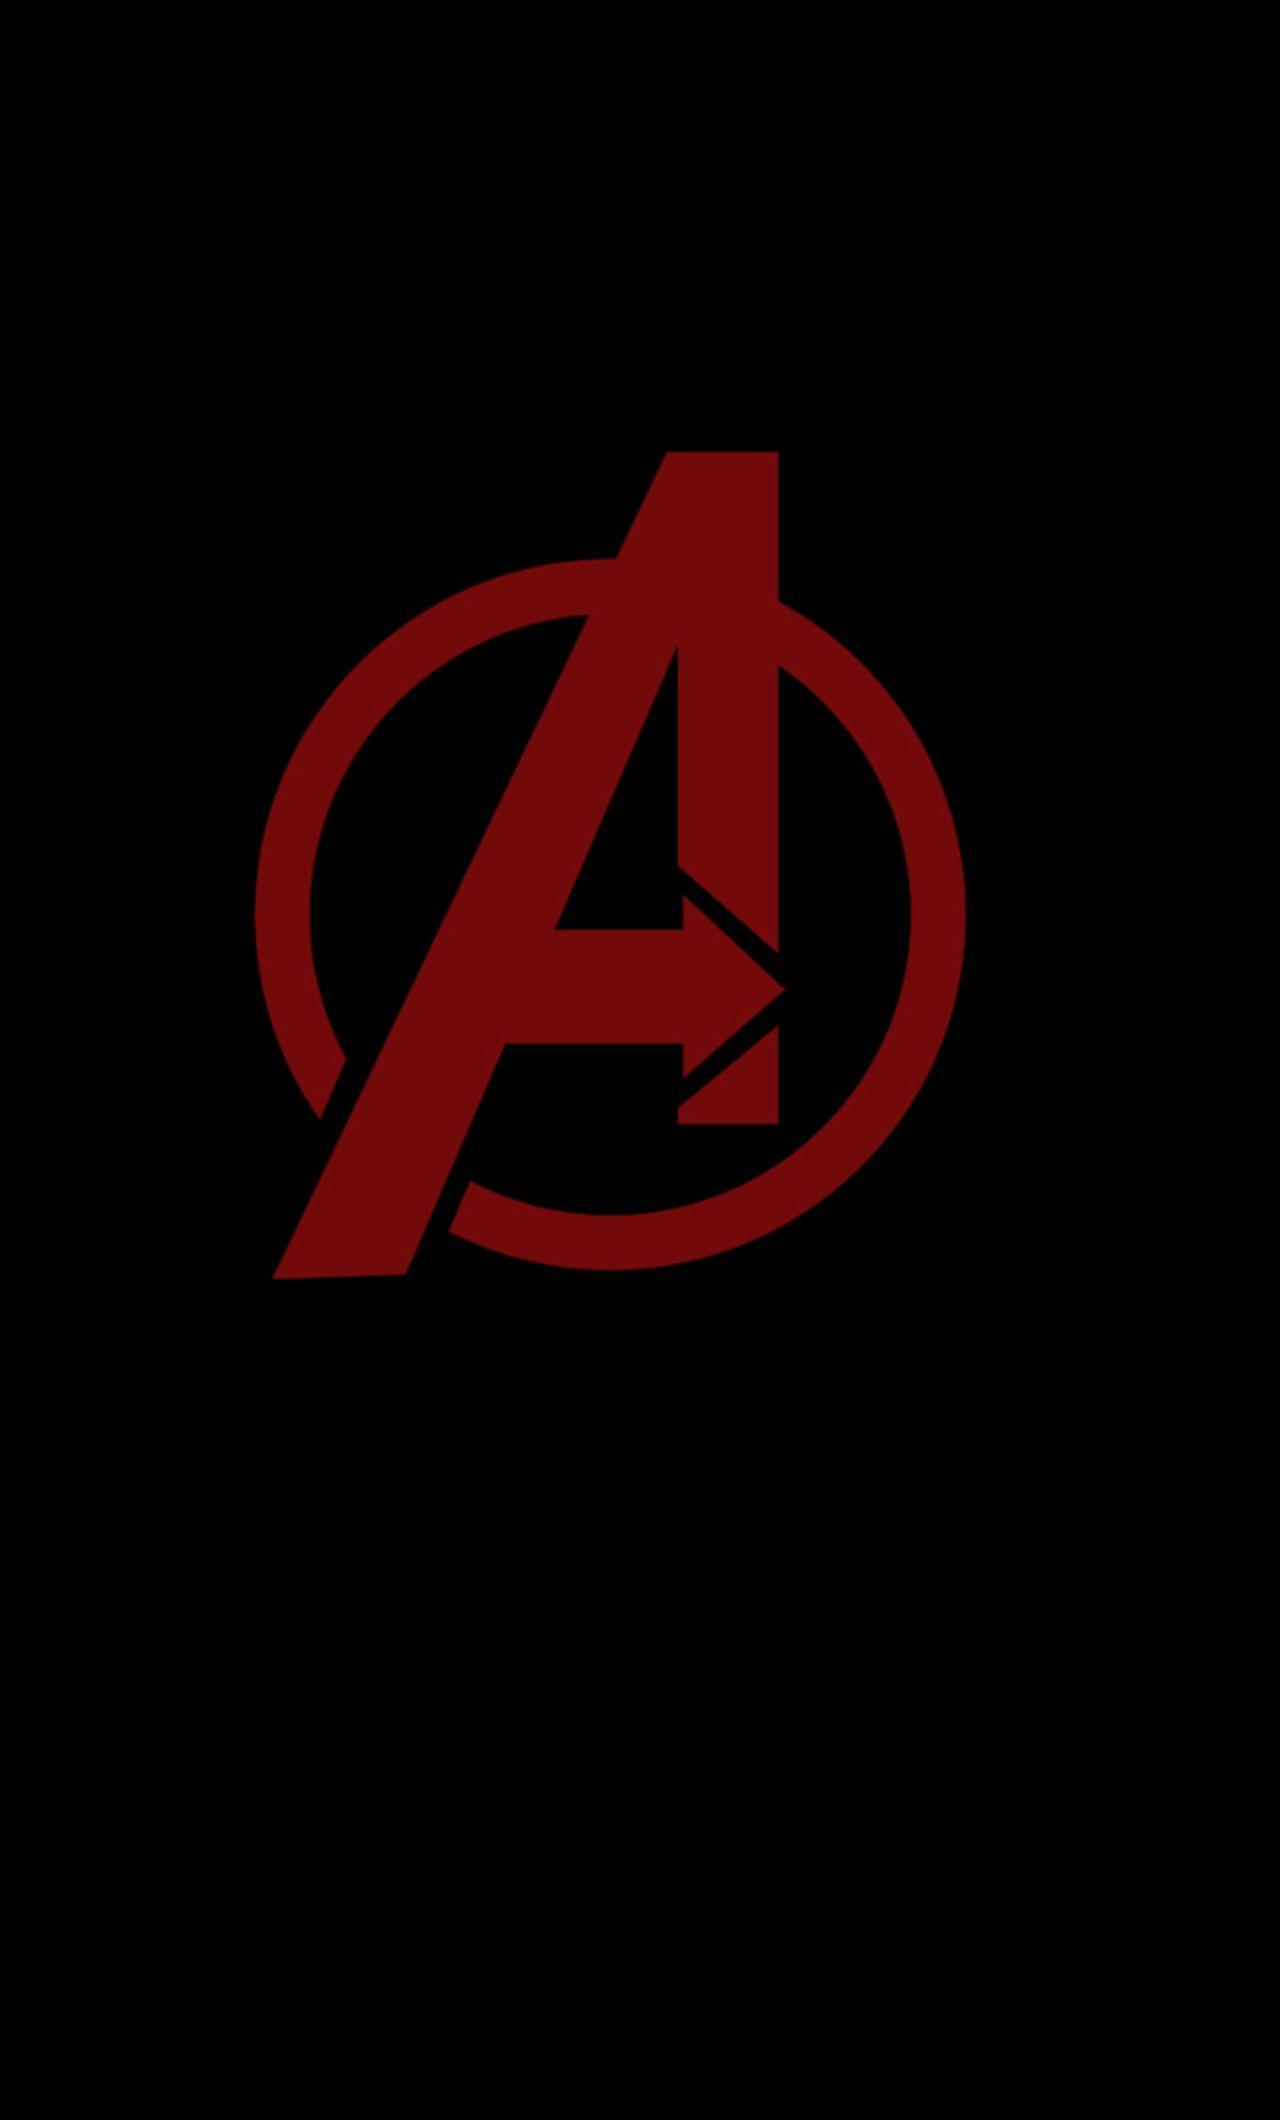 Avengers Minimal Logo Iphone Hd 4k Wallpaper Data Src Avengers Logo Wallpaper Hd For Mobile 2946246 Hd Wallpaper Backgrounds Download